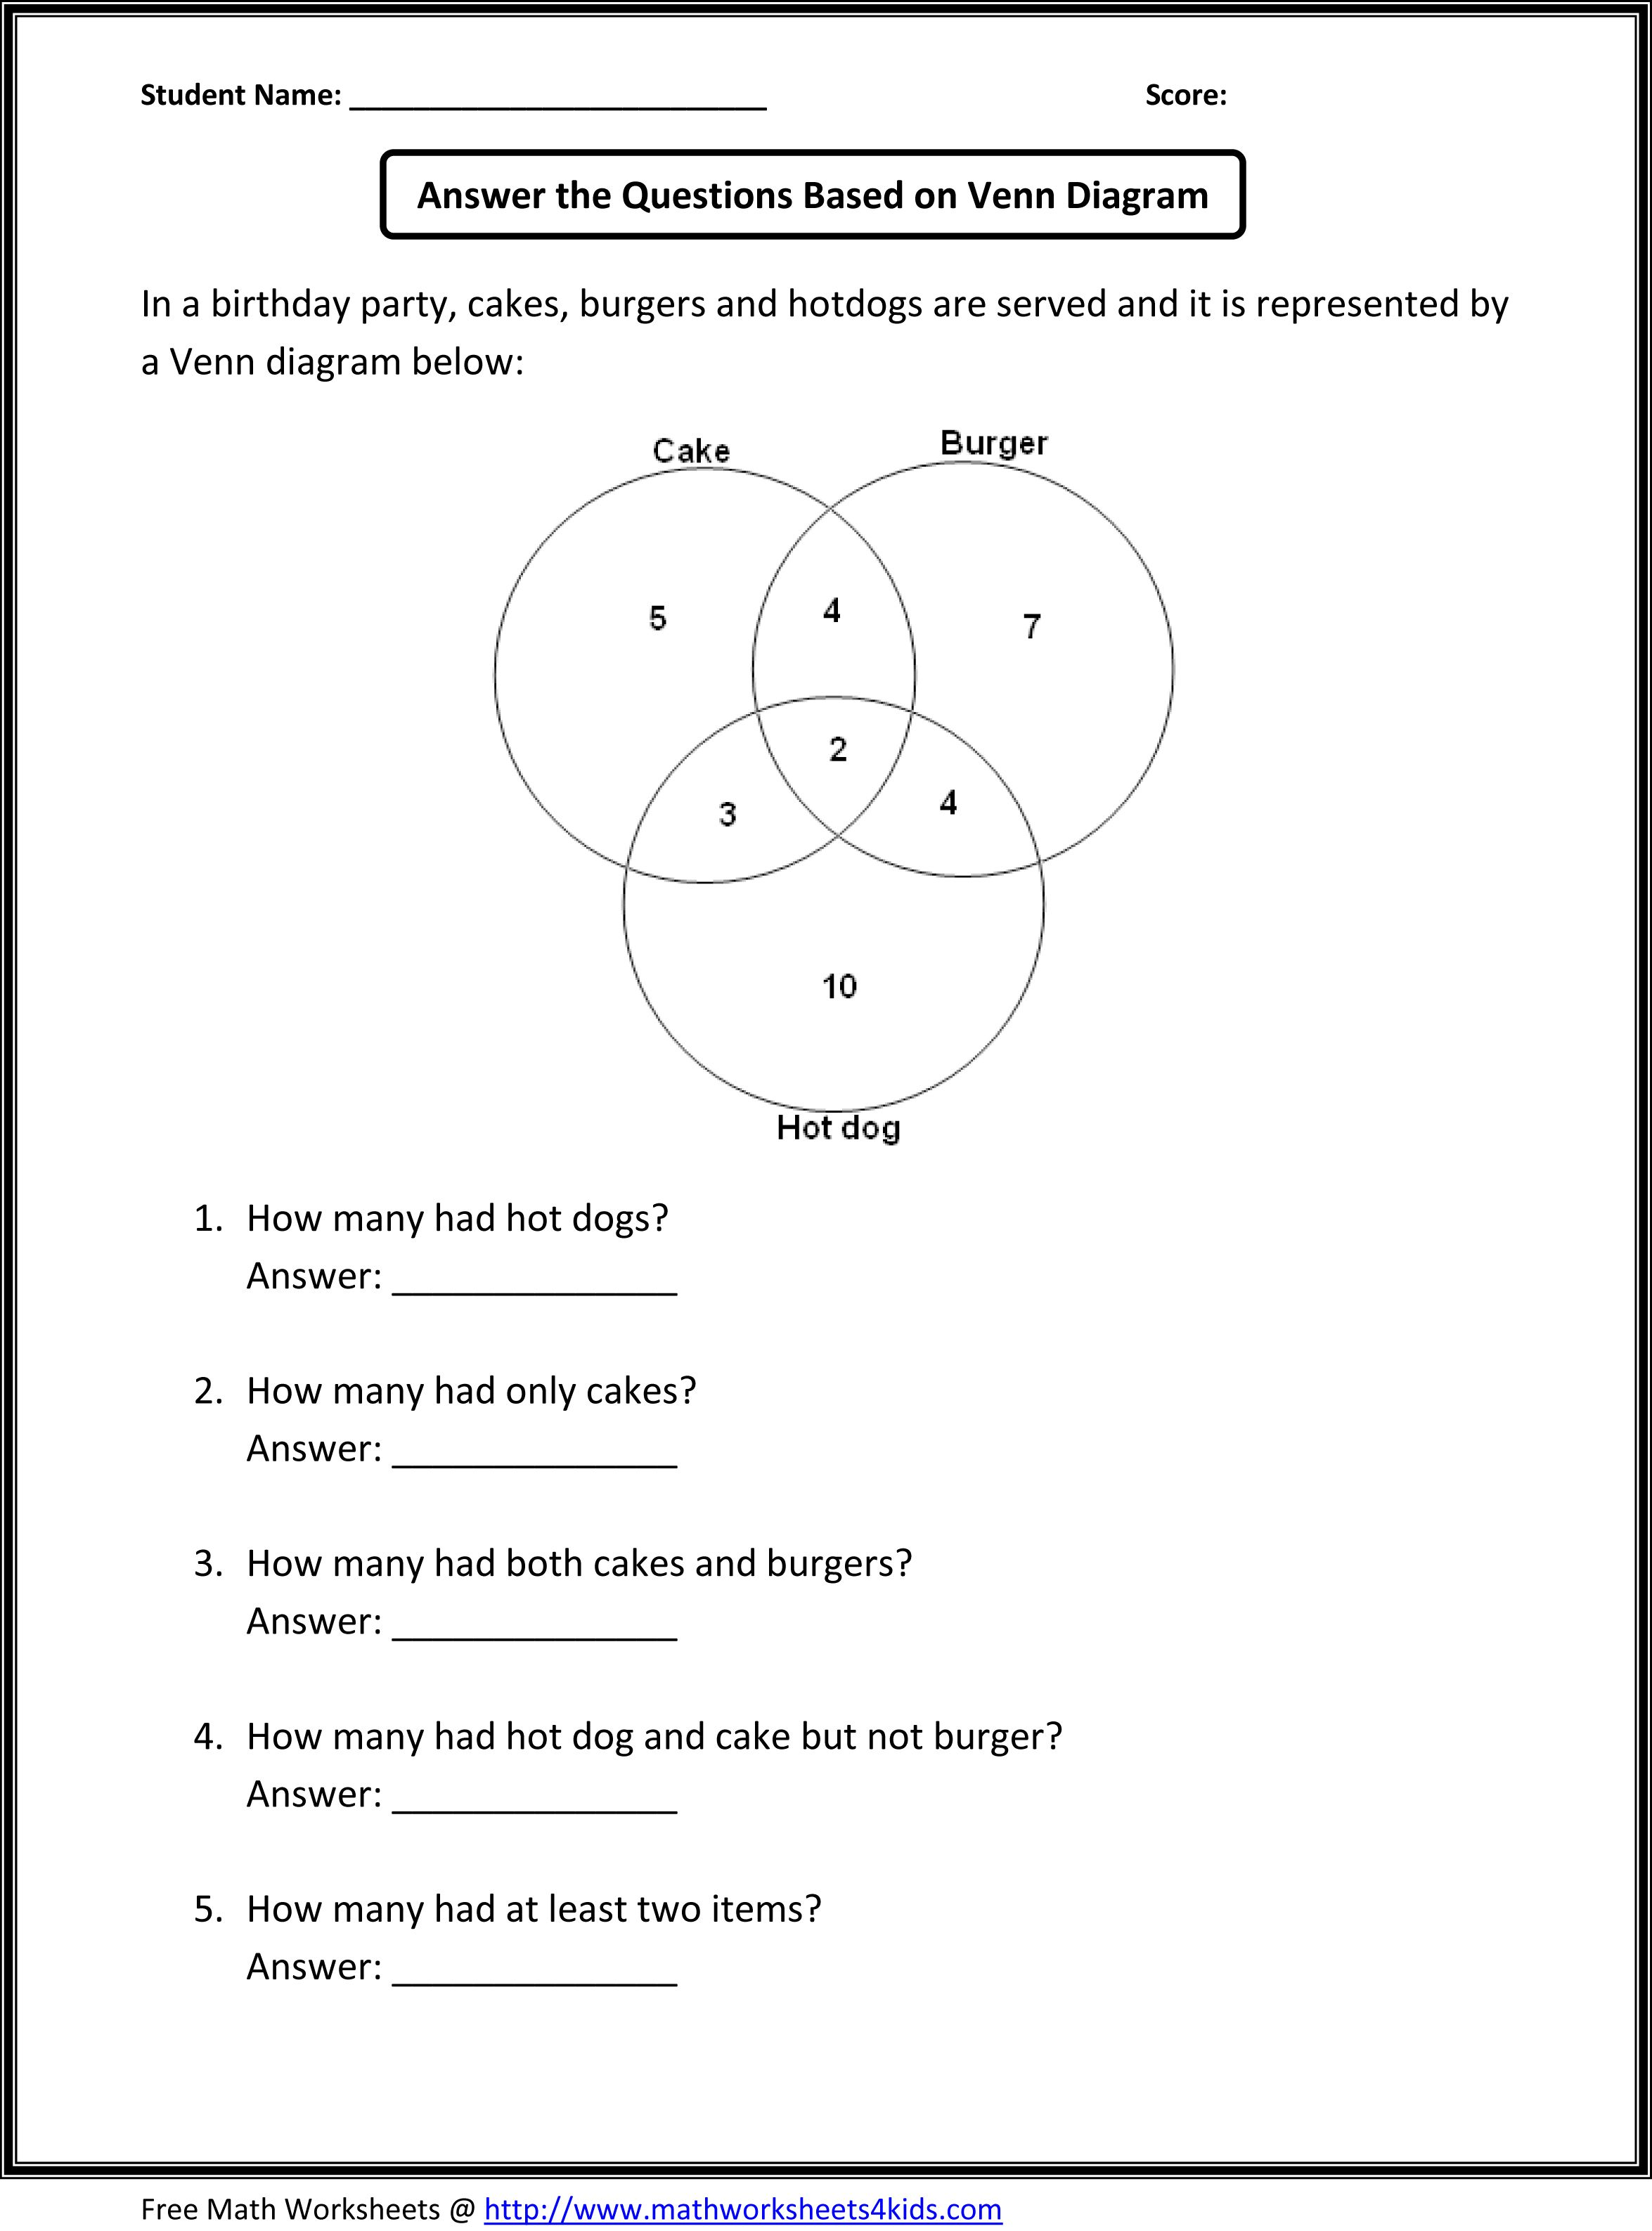 ib math studies venn diagrams blower motor wiring diagram word problems school pinterest